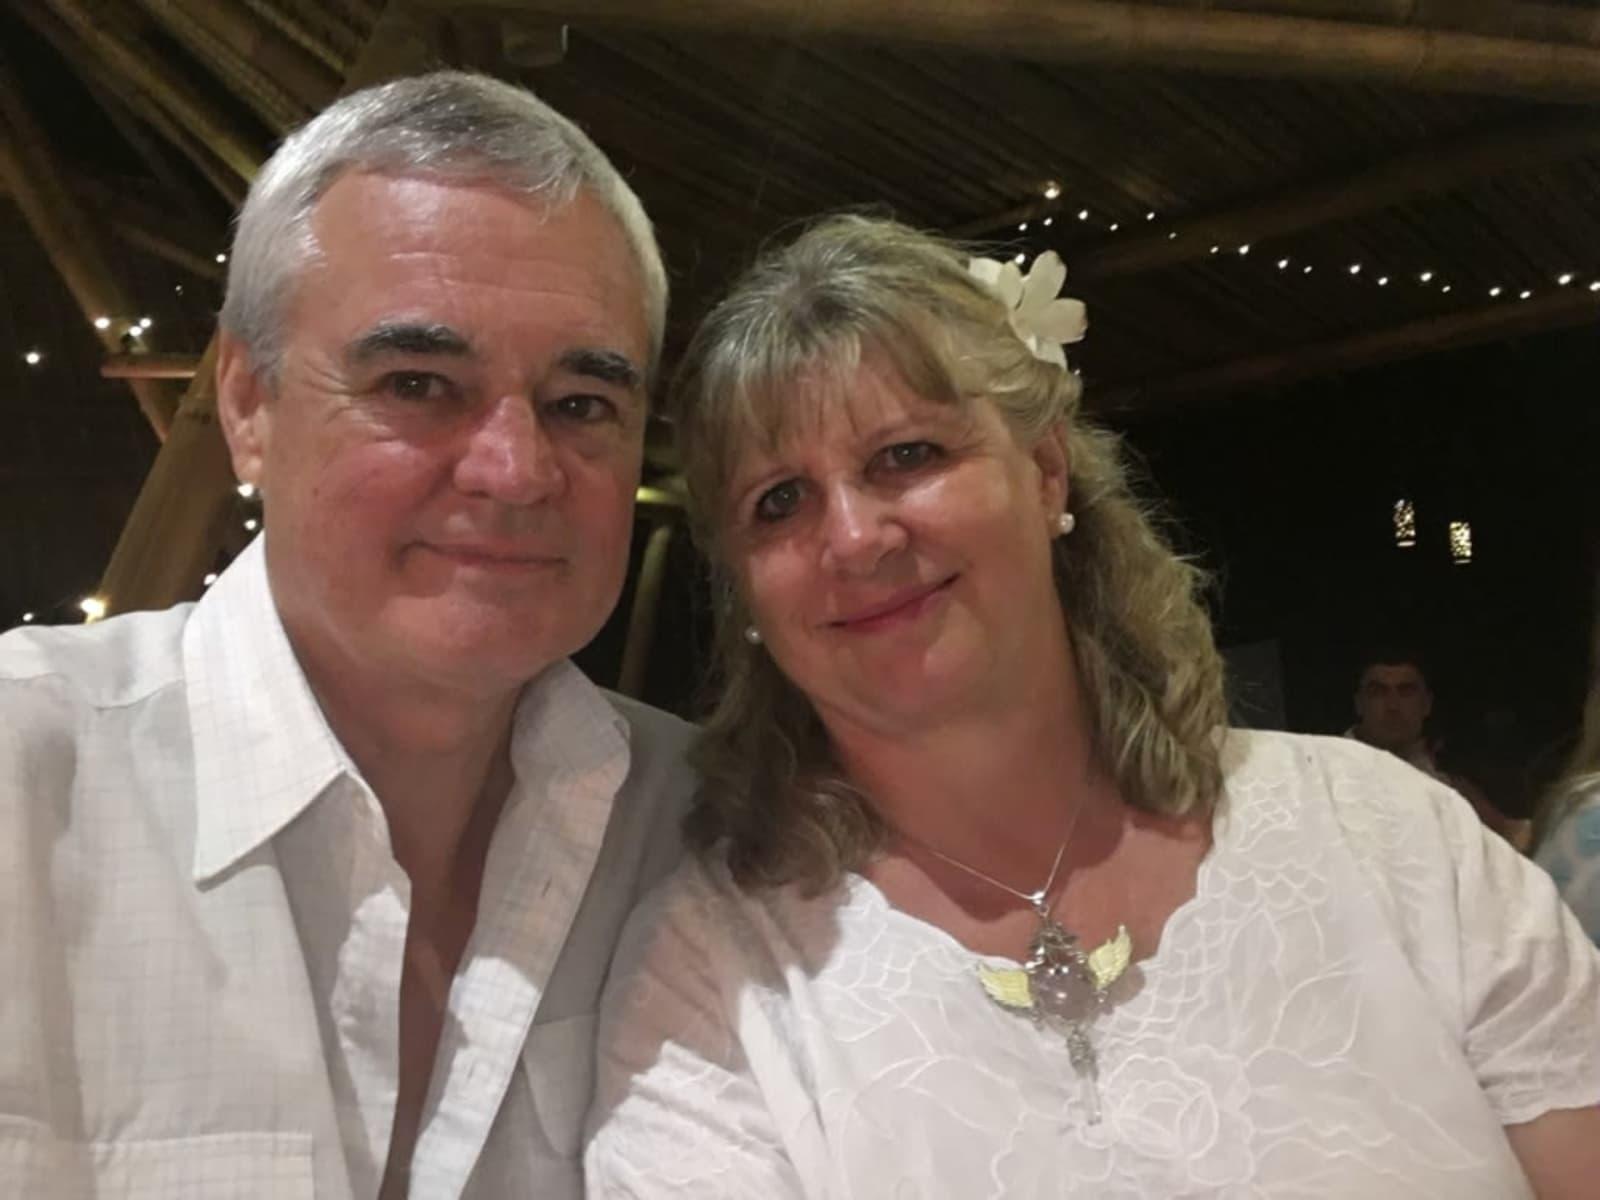 Steve & Gillian from Canberra, Australian Capital Territory, Australia